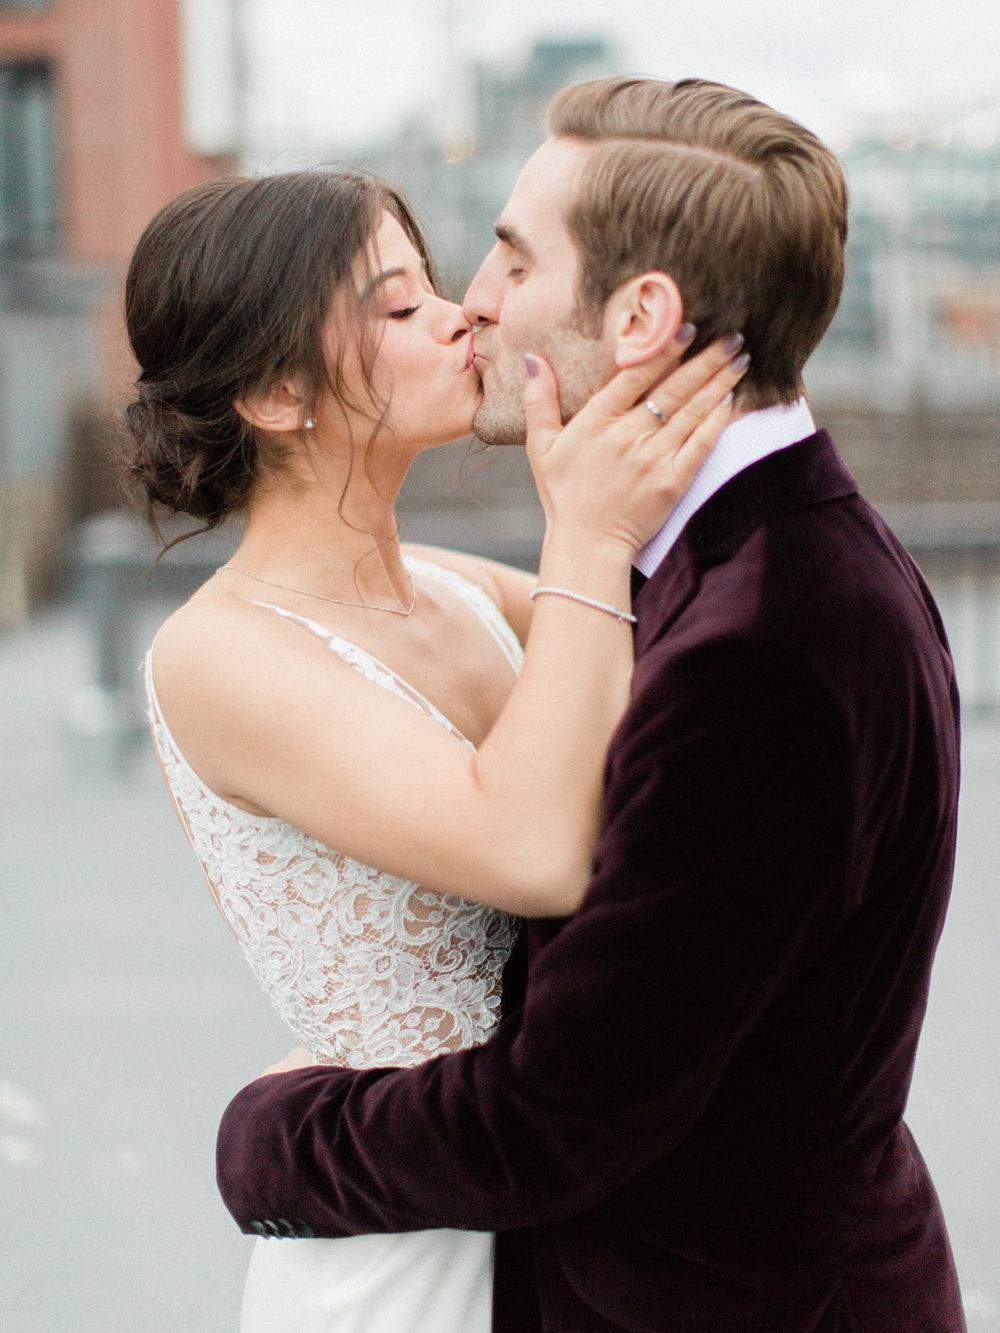 Toronto-wedding-photographer-intimate-italian-the-burroughes-downtown122.jpg